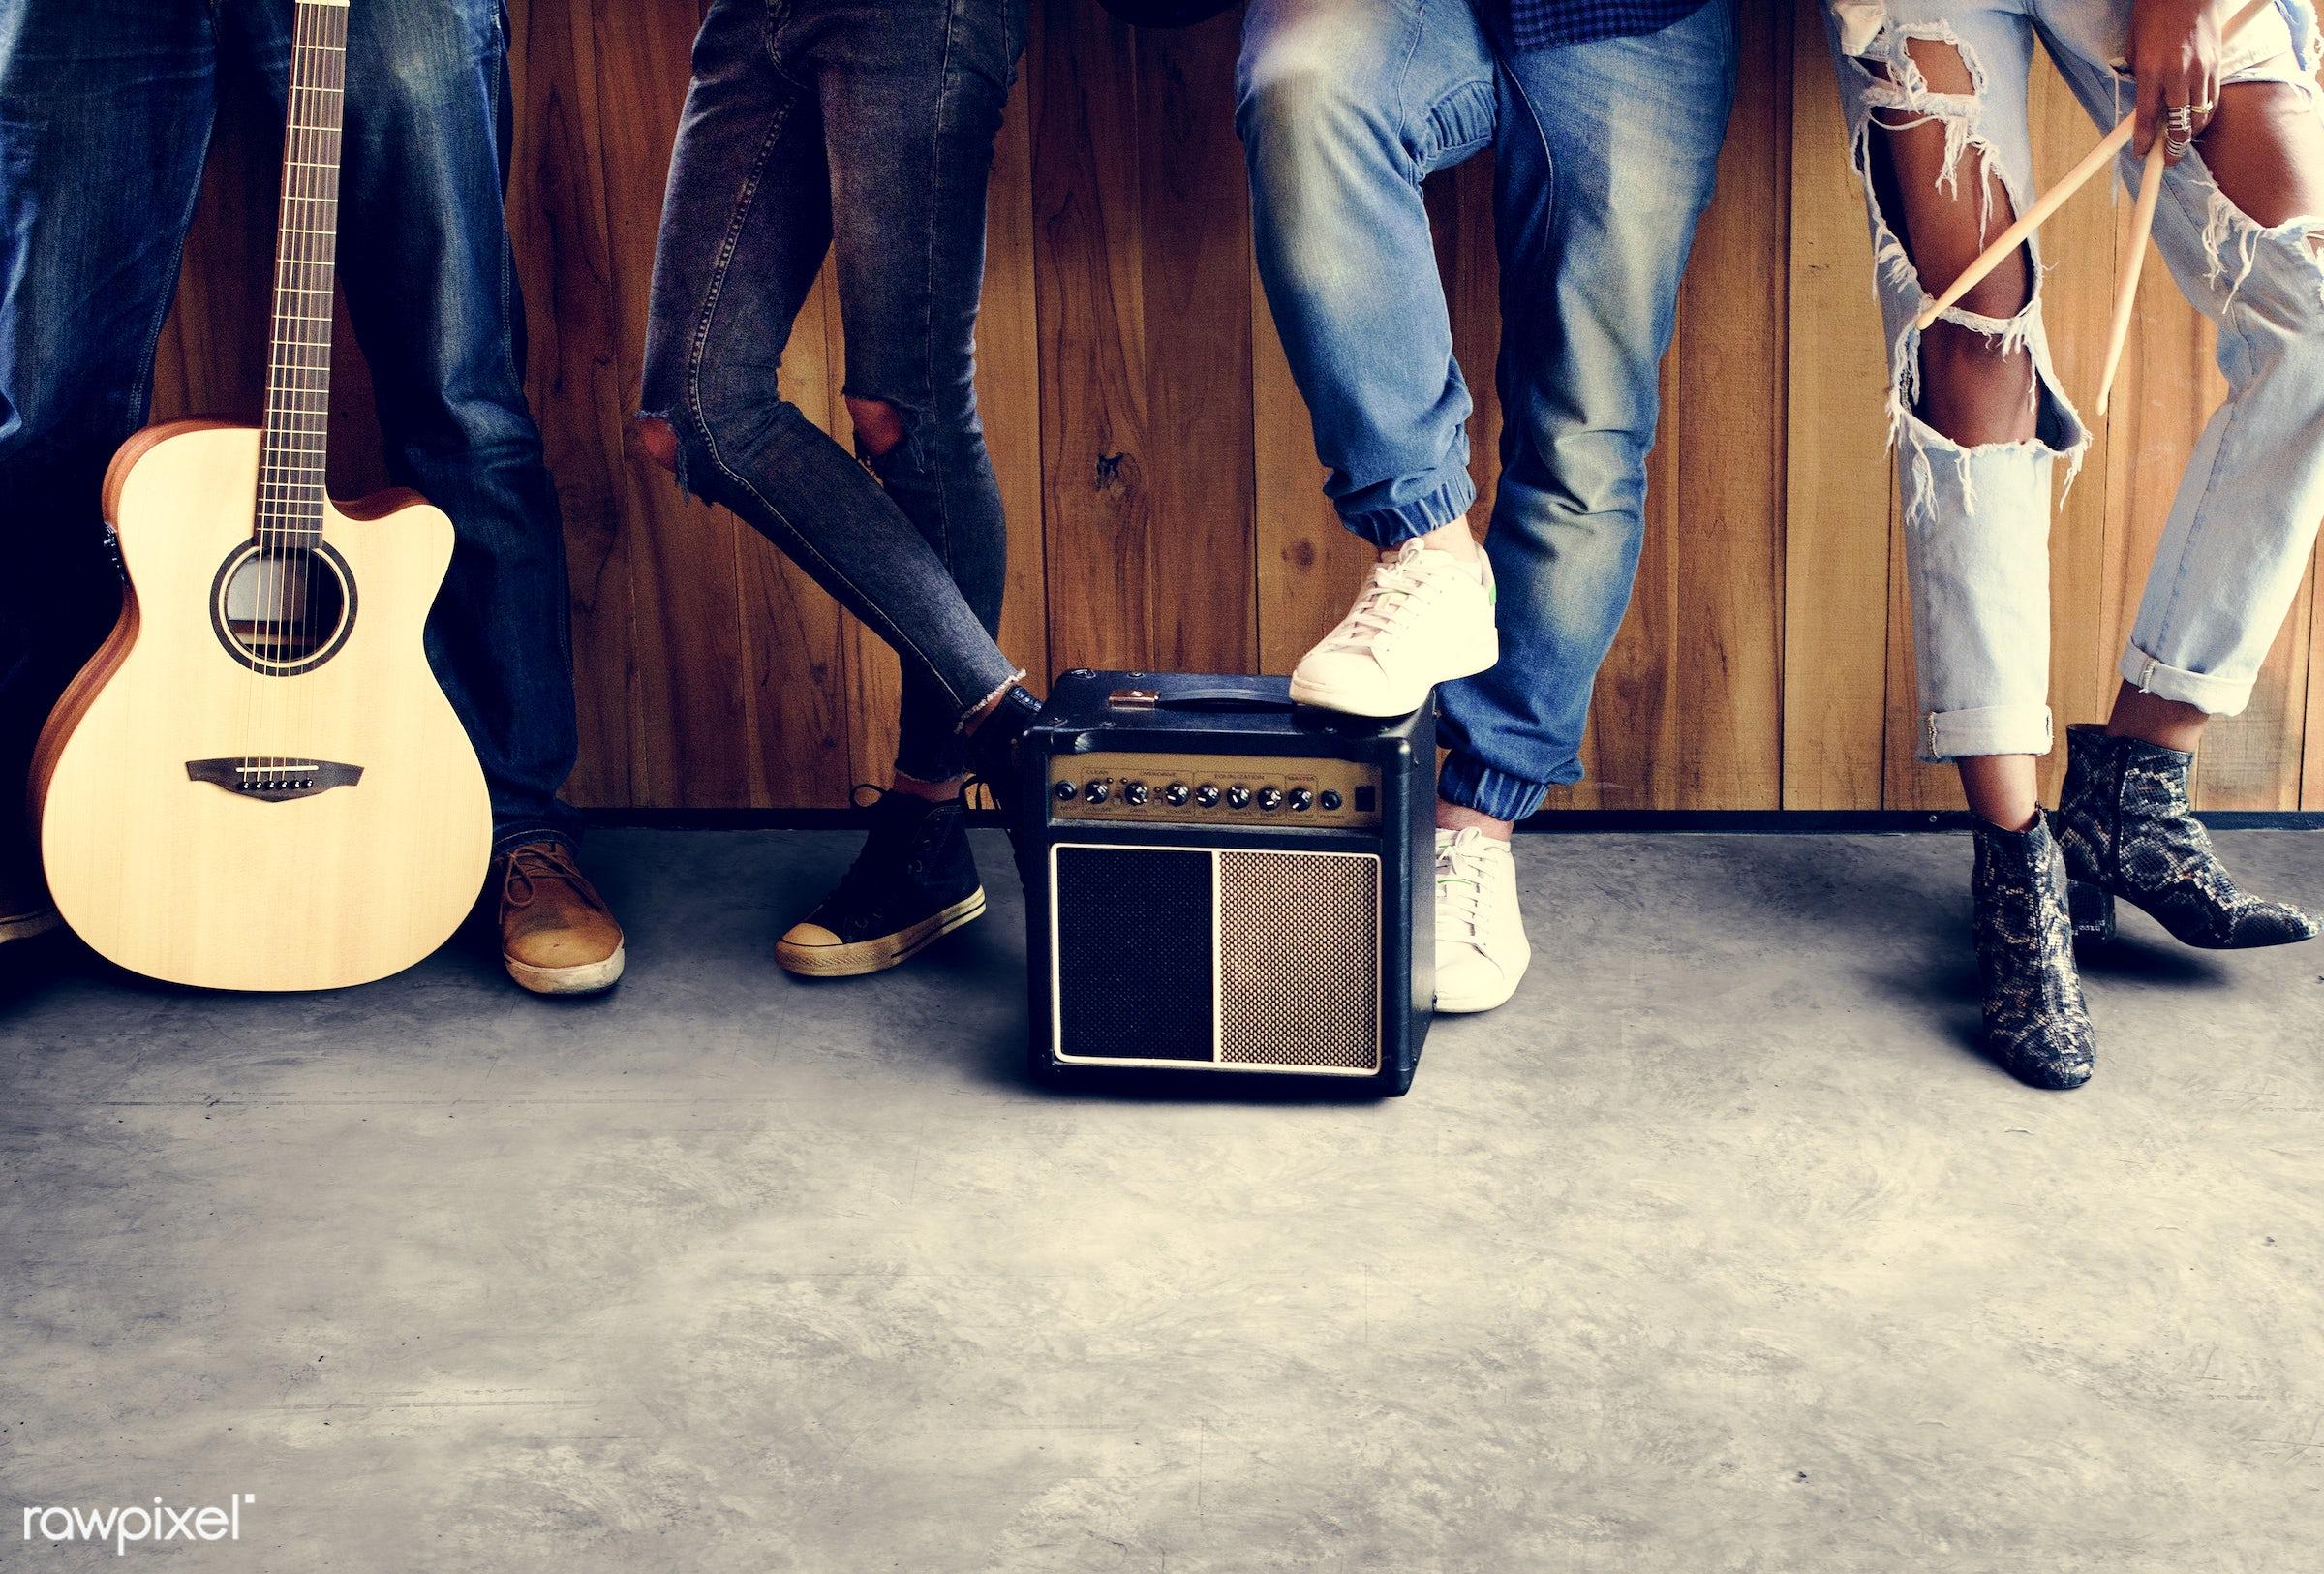 amp, amplifier, band, diversity, drum sticks, drummer, entertainment, female, friends, friendship, fun, guitar, guitarist,...